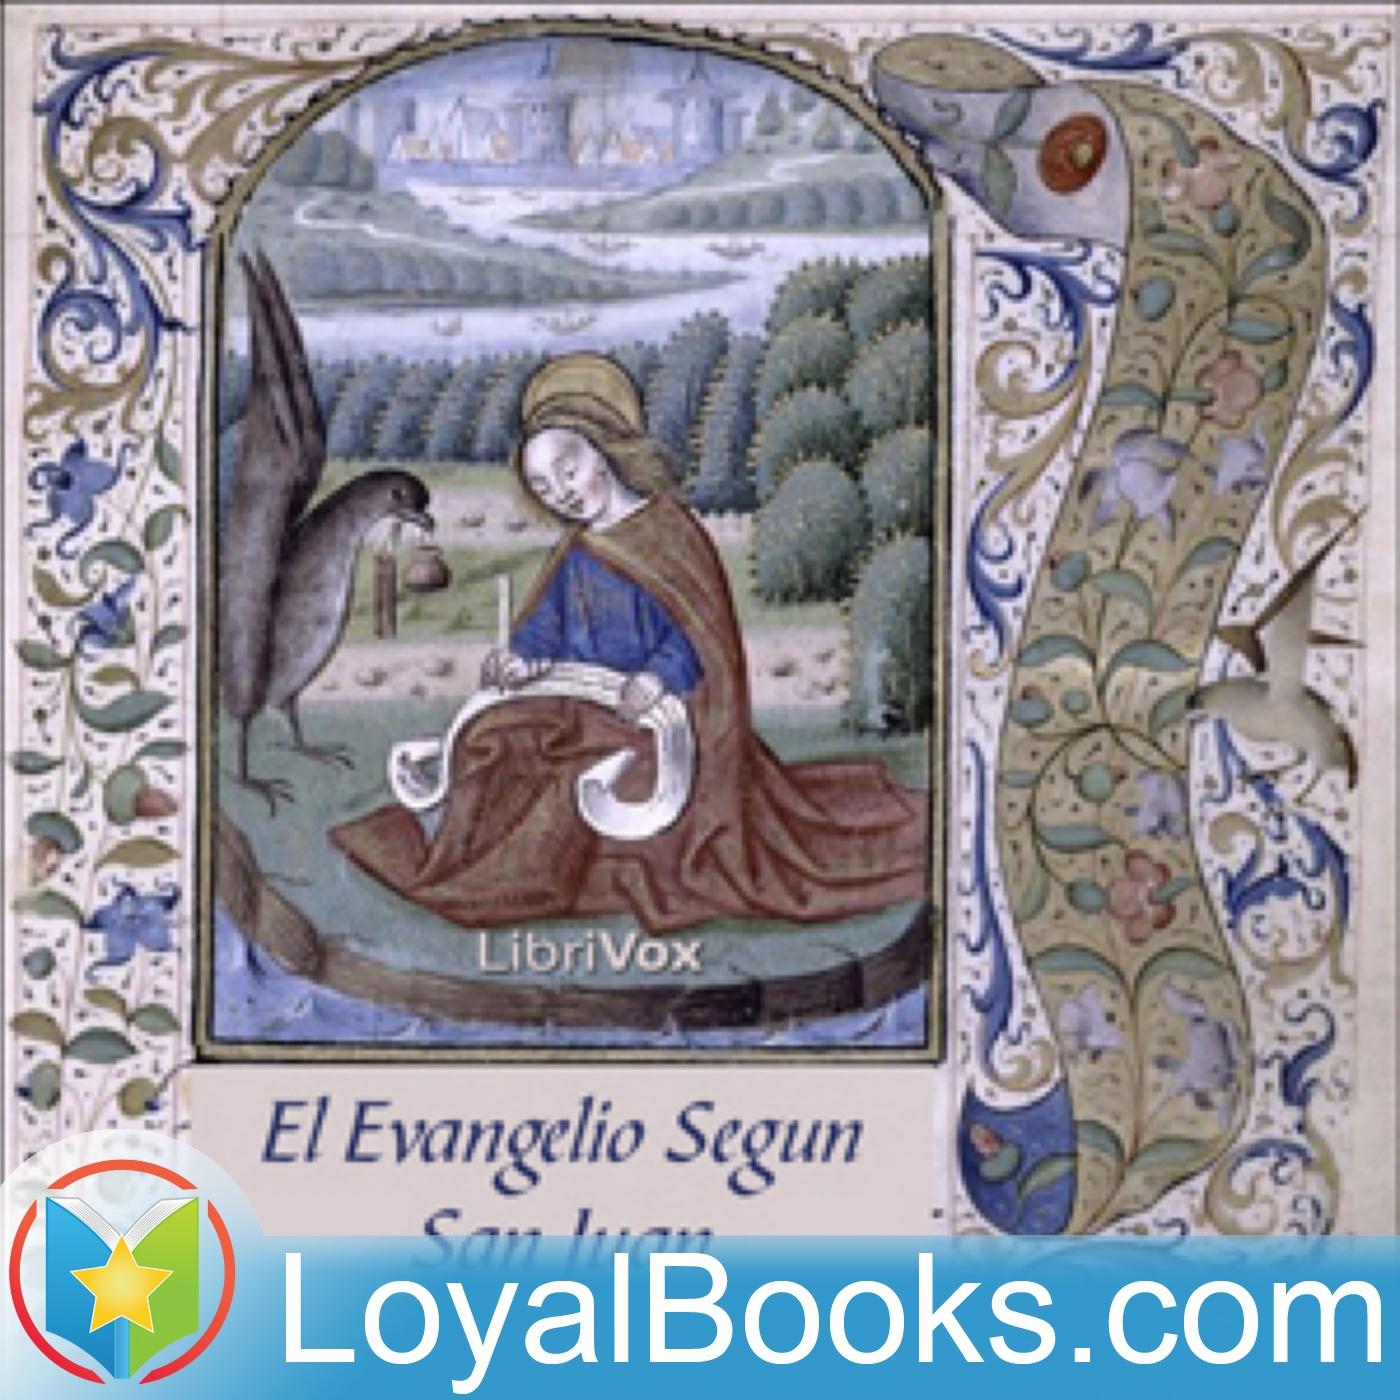 <![CDATA[El Evangelio Segun San Juan by Reina Valera]]>